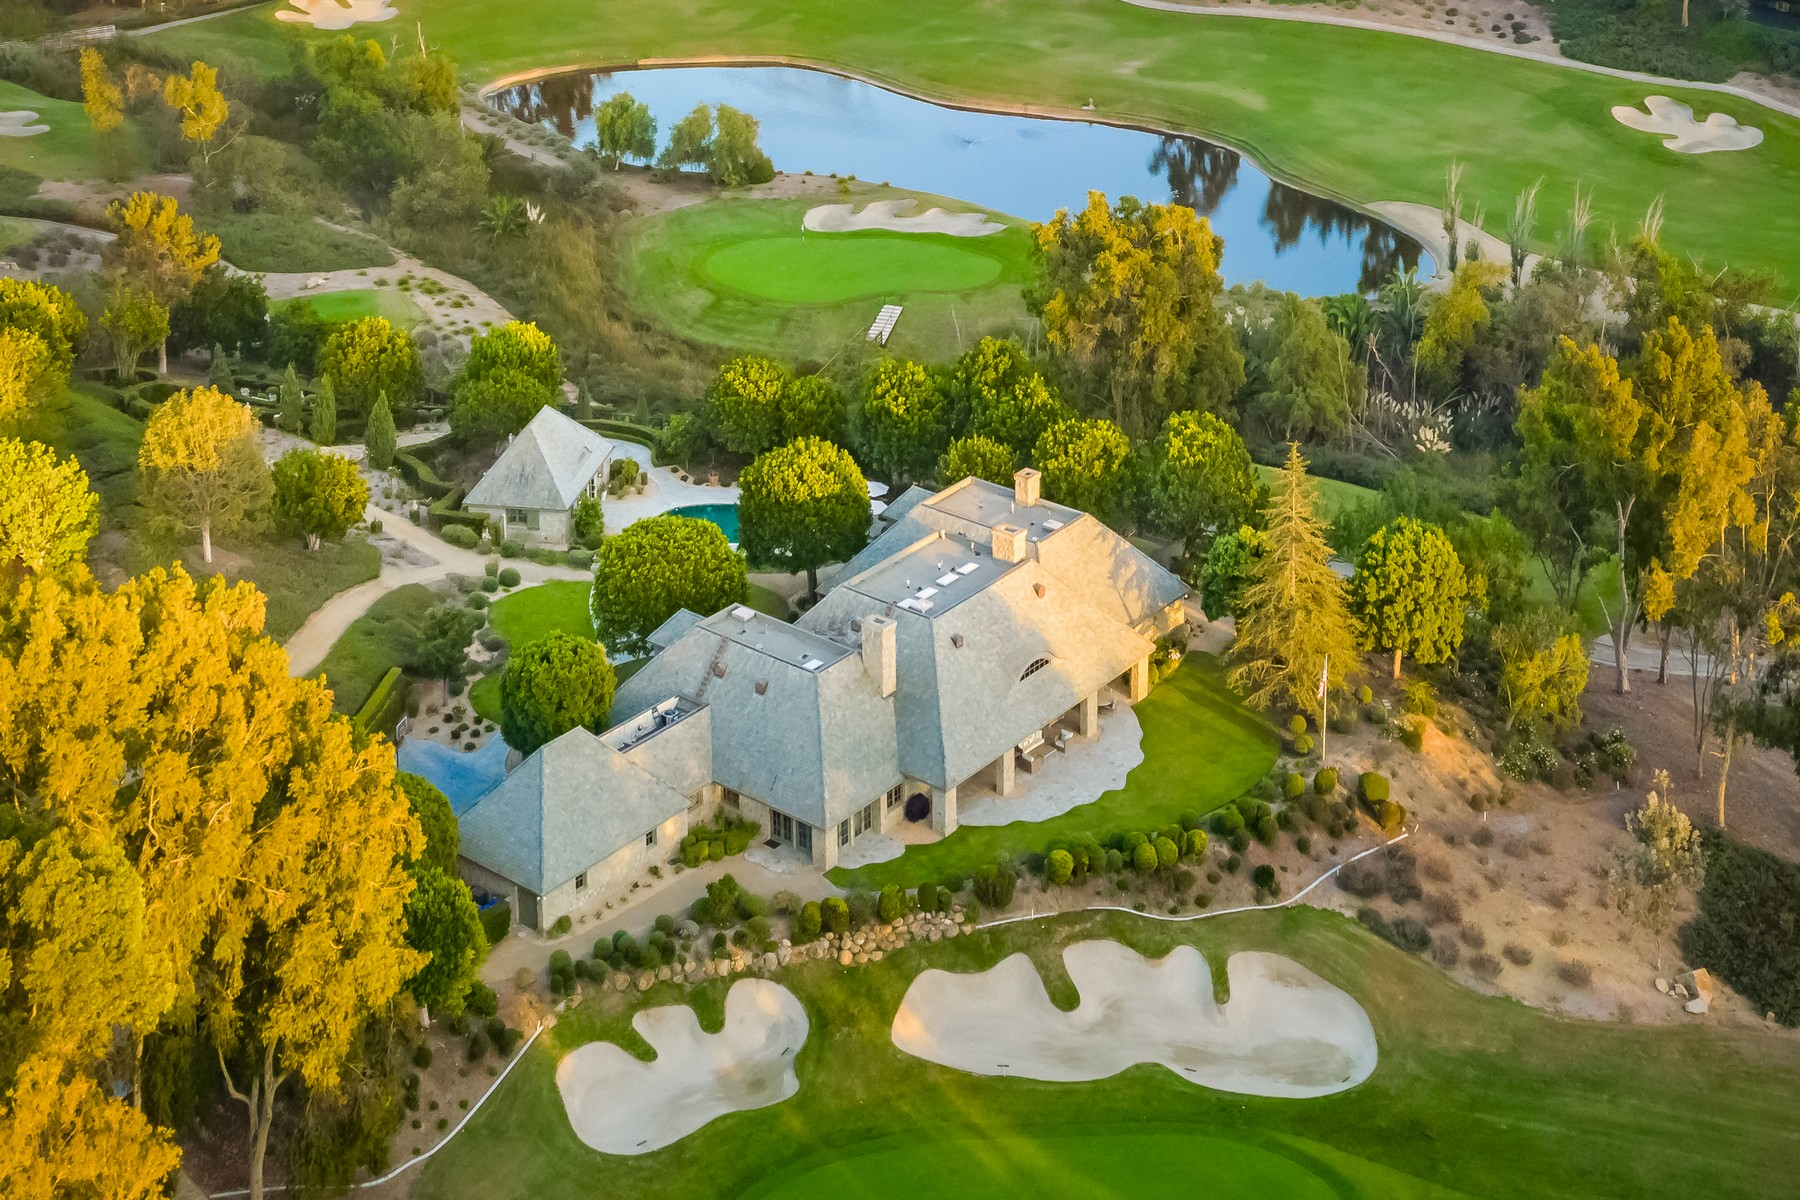 Single Family Home for Active at 14497 Emerald Lane 14497 Emerald Lane Rancho Santa Fe, California 92067 United States